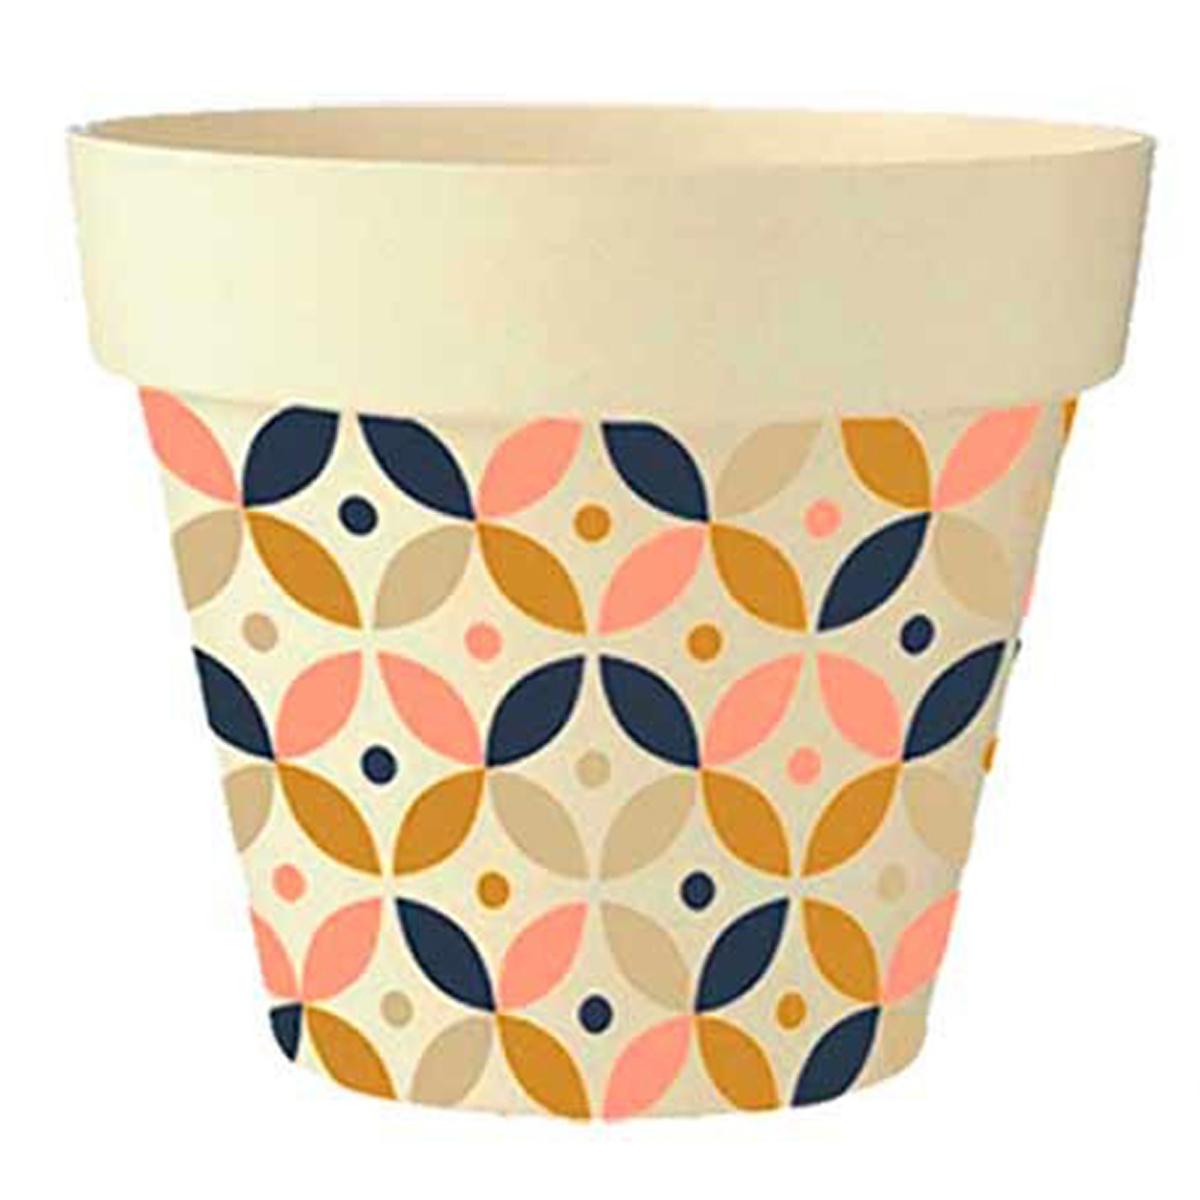 Cache-pot bambou \'Boho\' rose marron marine beige -  17x18 cm - [Q6391]